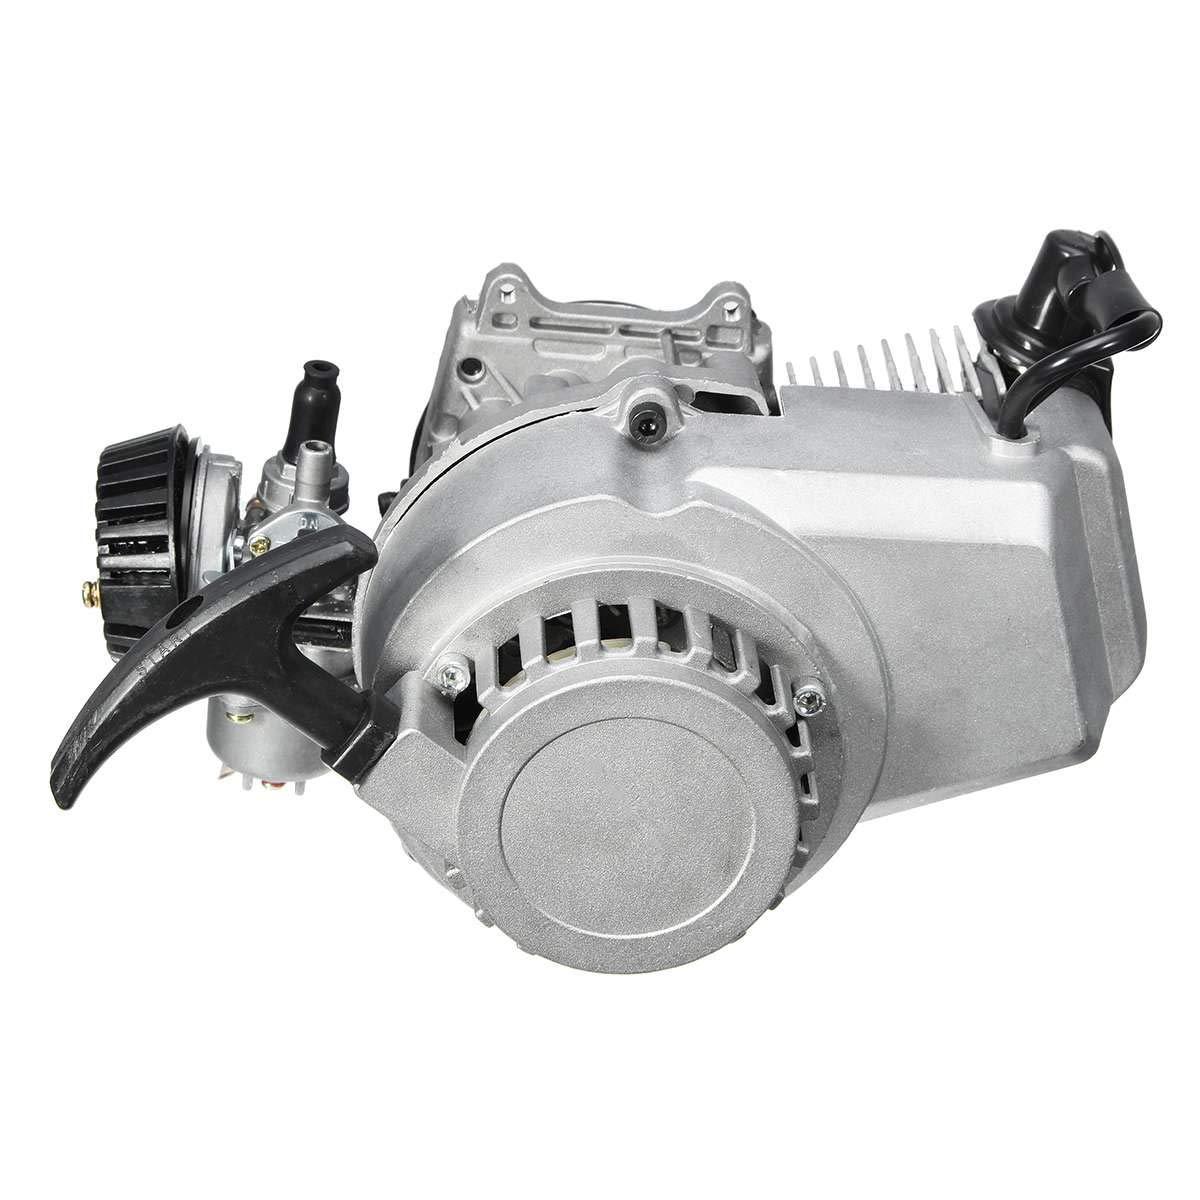 49cc 2-Stroke CDI Hand Pull Start Engine Motor For Pocket Bike Mini Dirt Bike ATV Scooter by Unkows (Image #3)